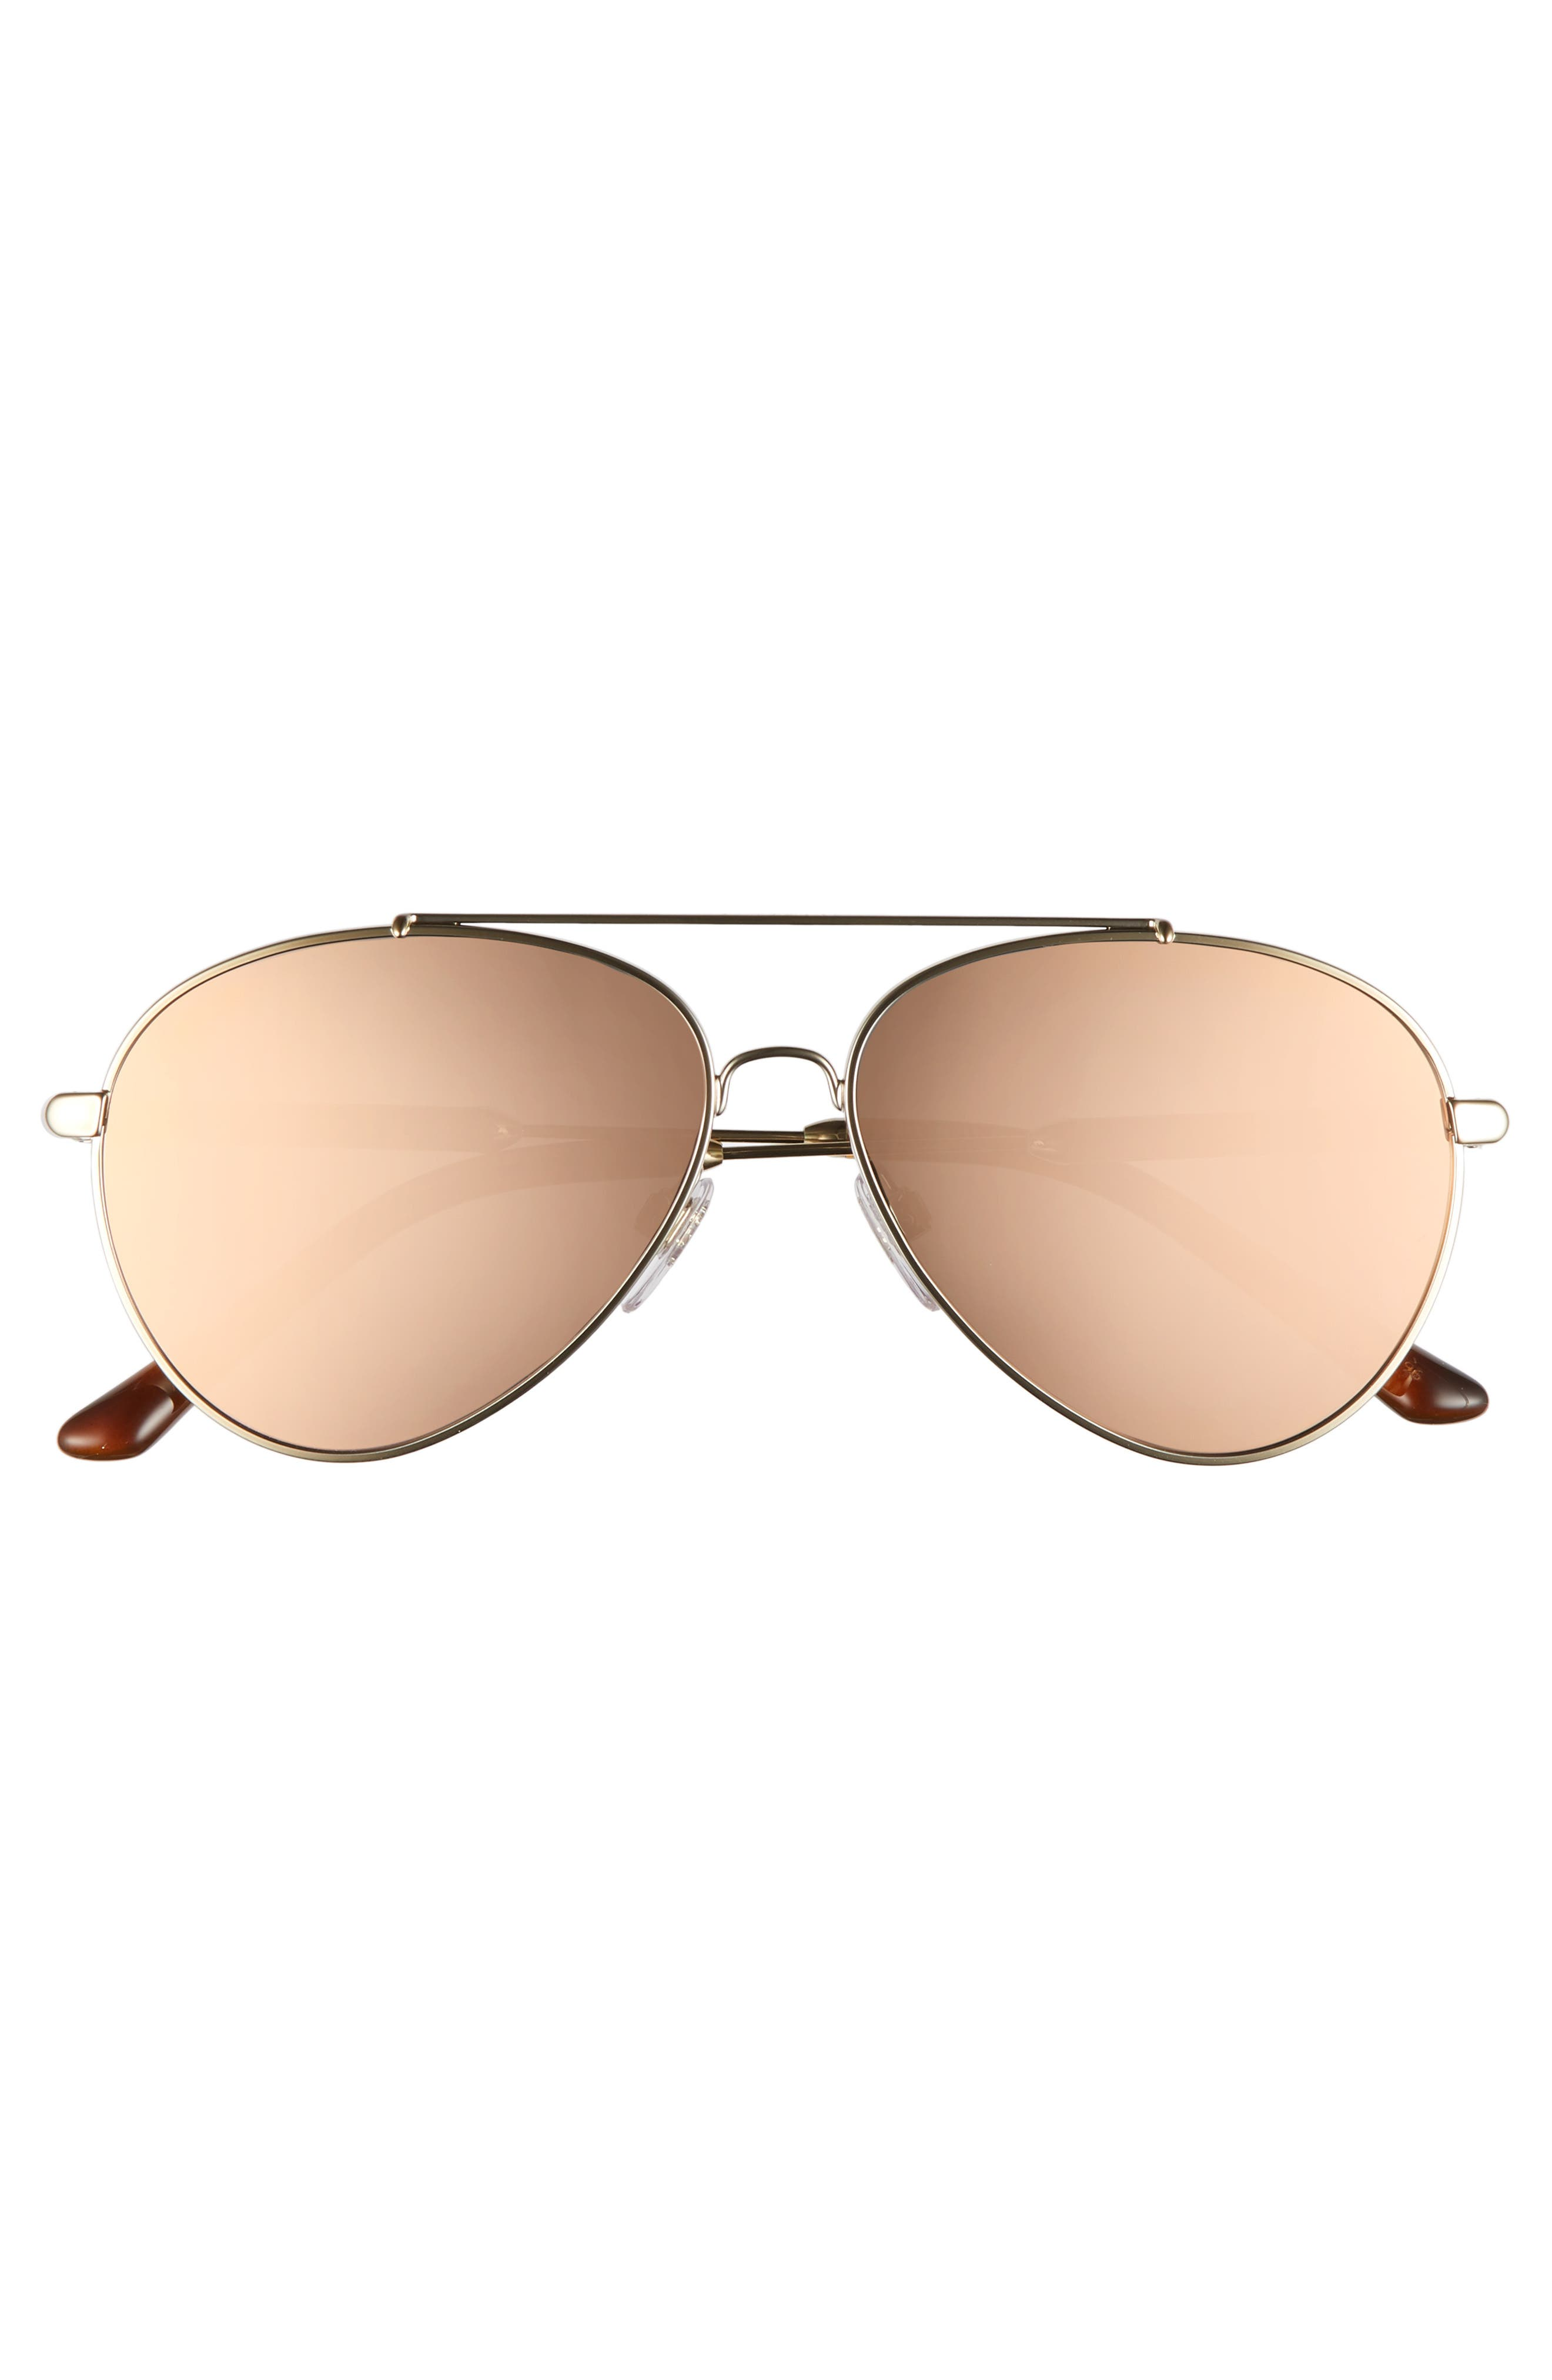 57mm Mirrored Aviator Sunglasses,                             Alternate thumbnail 3, color,                             031